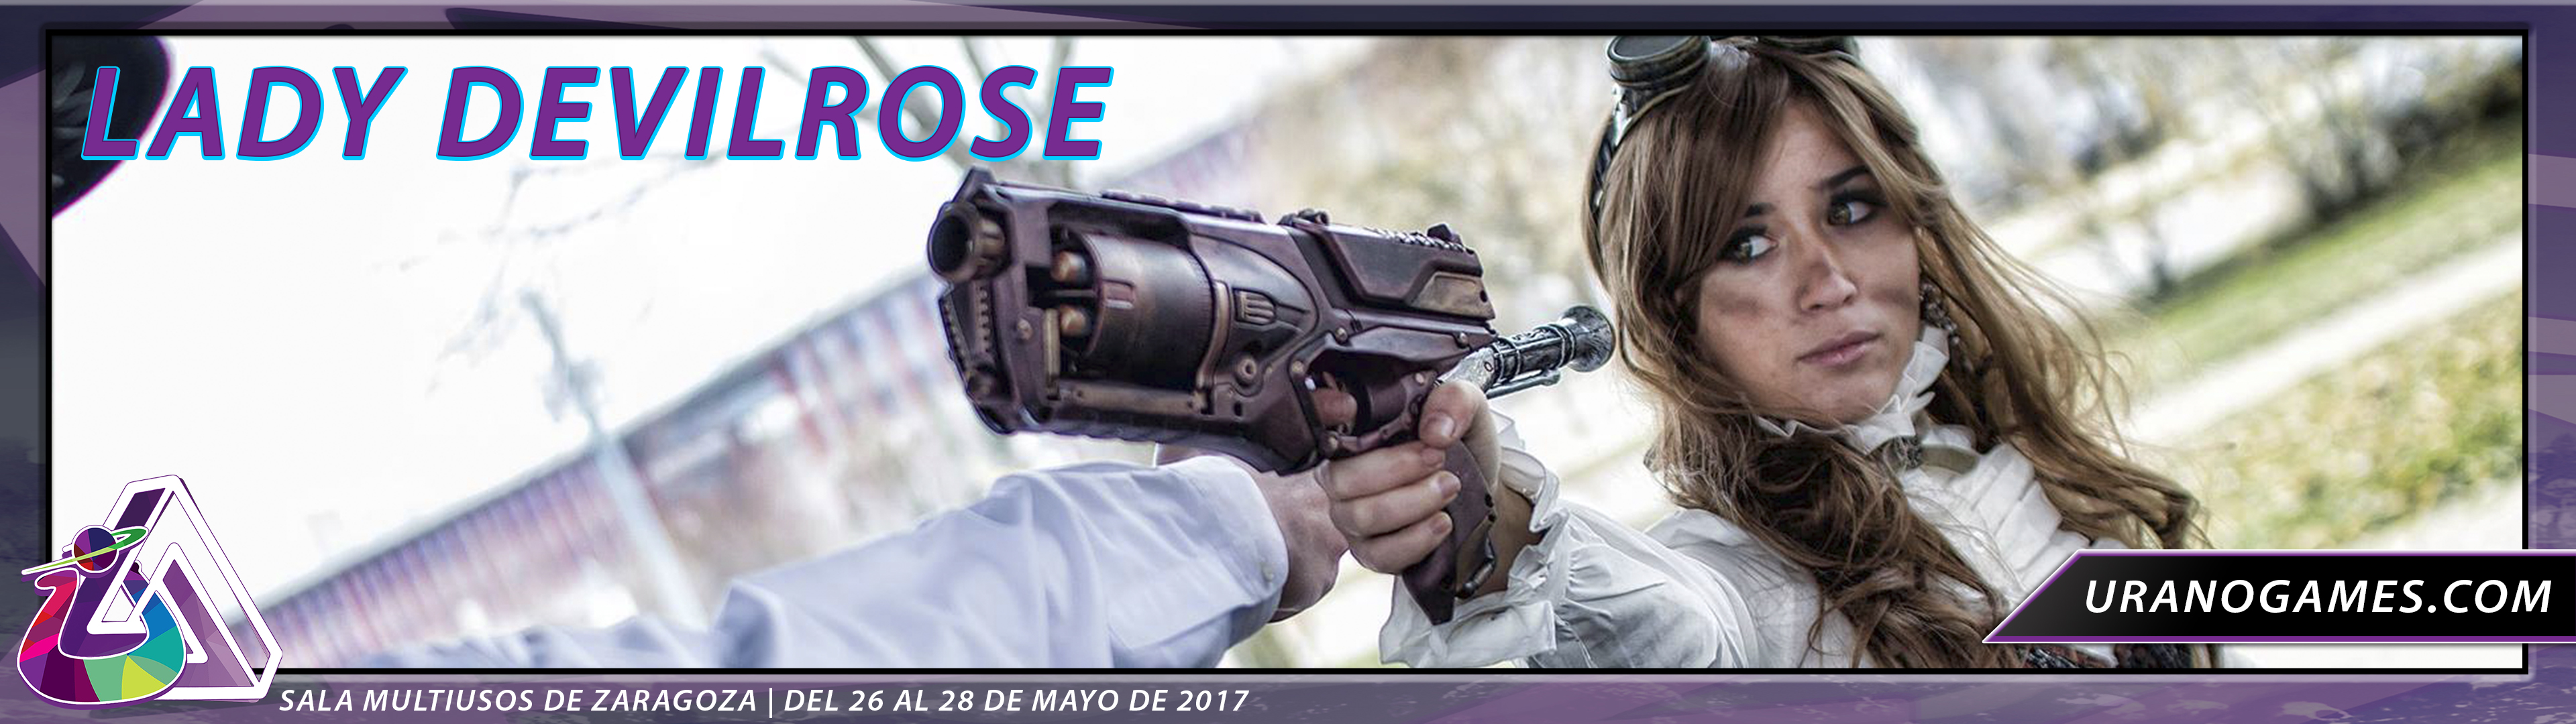 Concurso Cosplay Lady Devilrose Urano Games